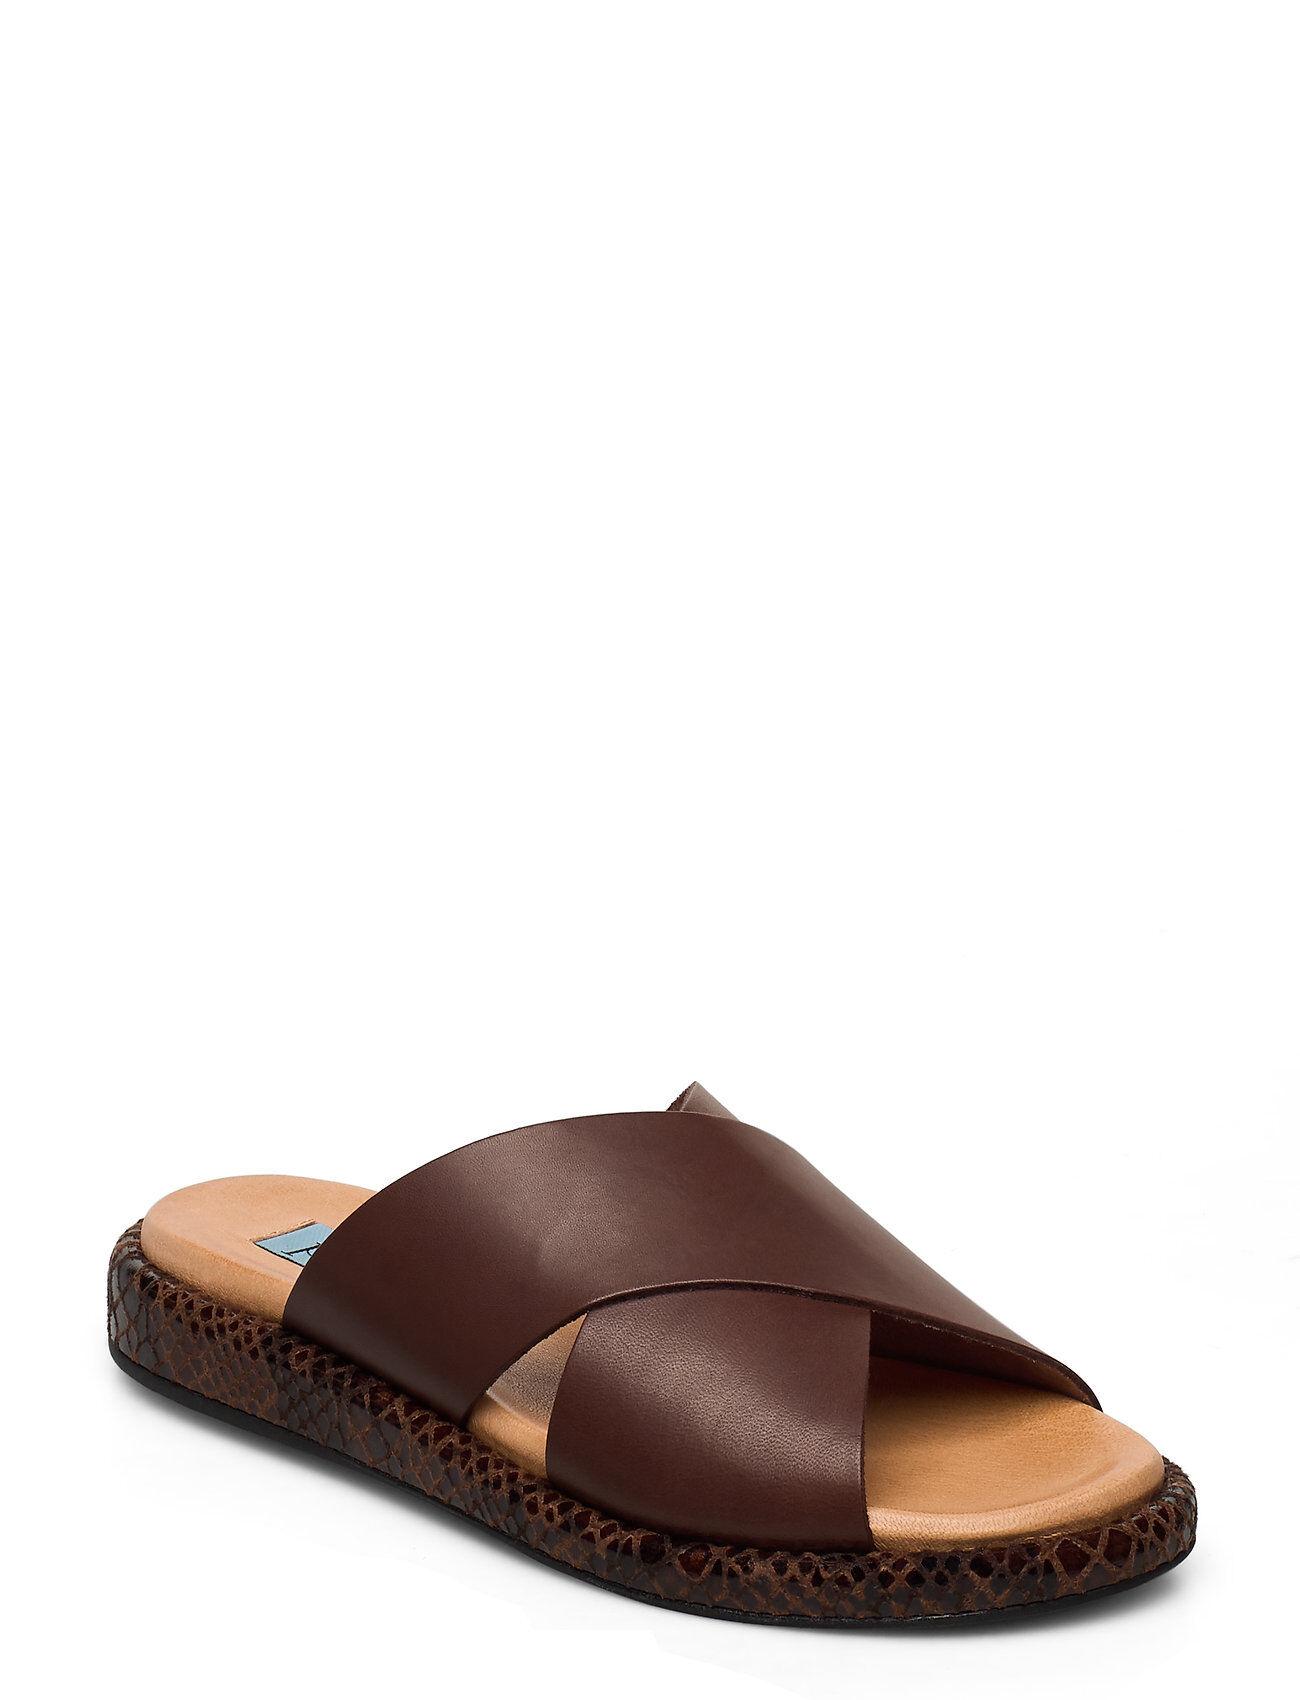 Apair Plateau Cross Mix Shoes Summer Shoes Flat Sandals Ruskea Apair